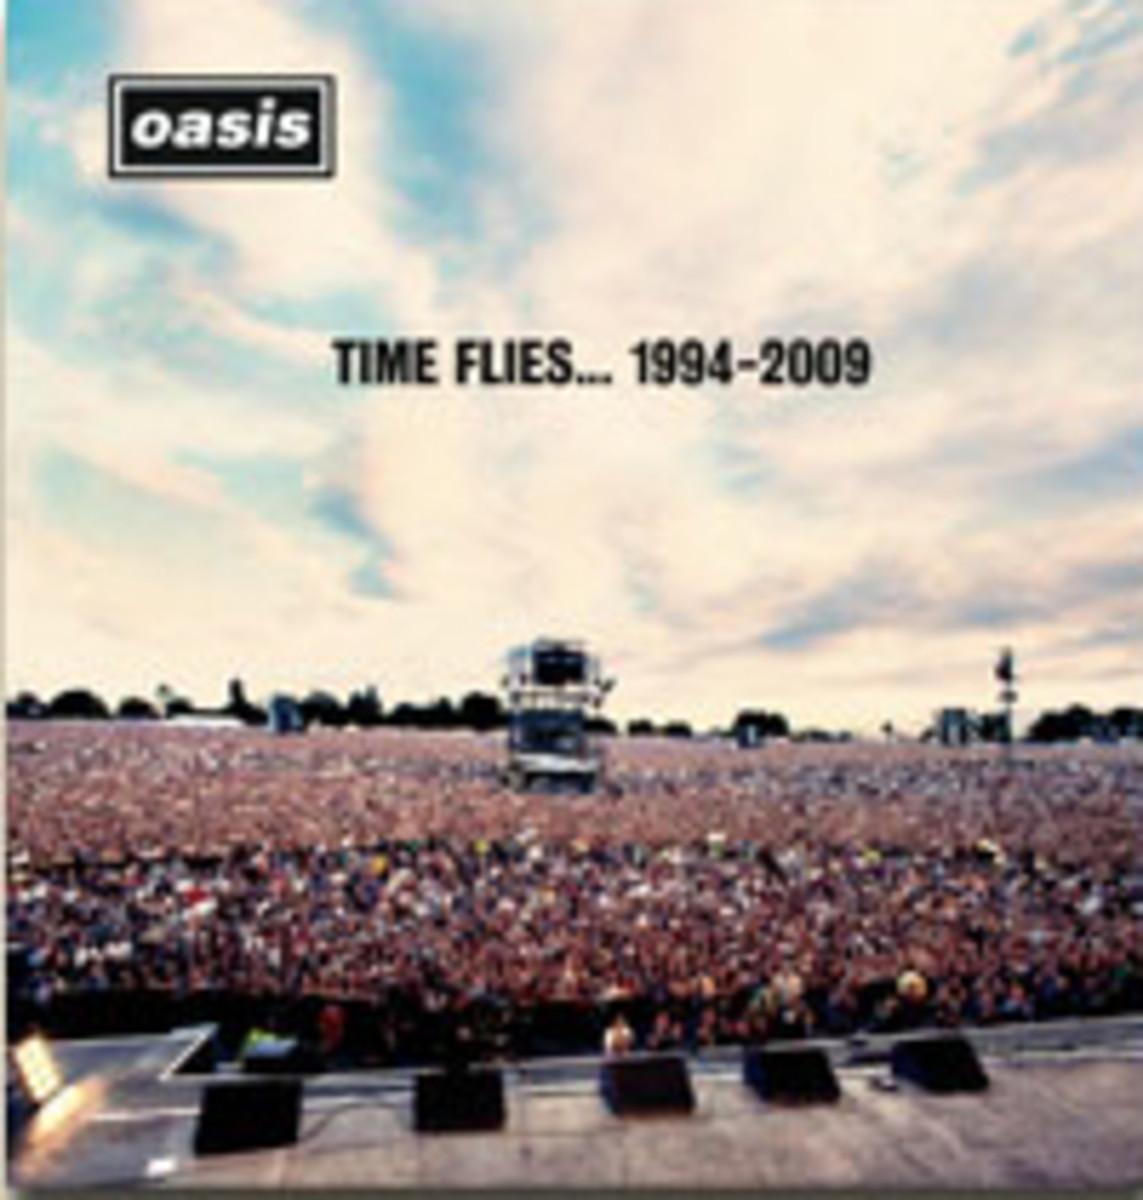 Oasis_Time_Flies